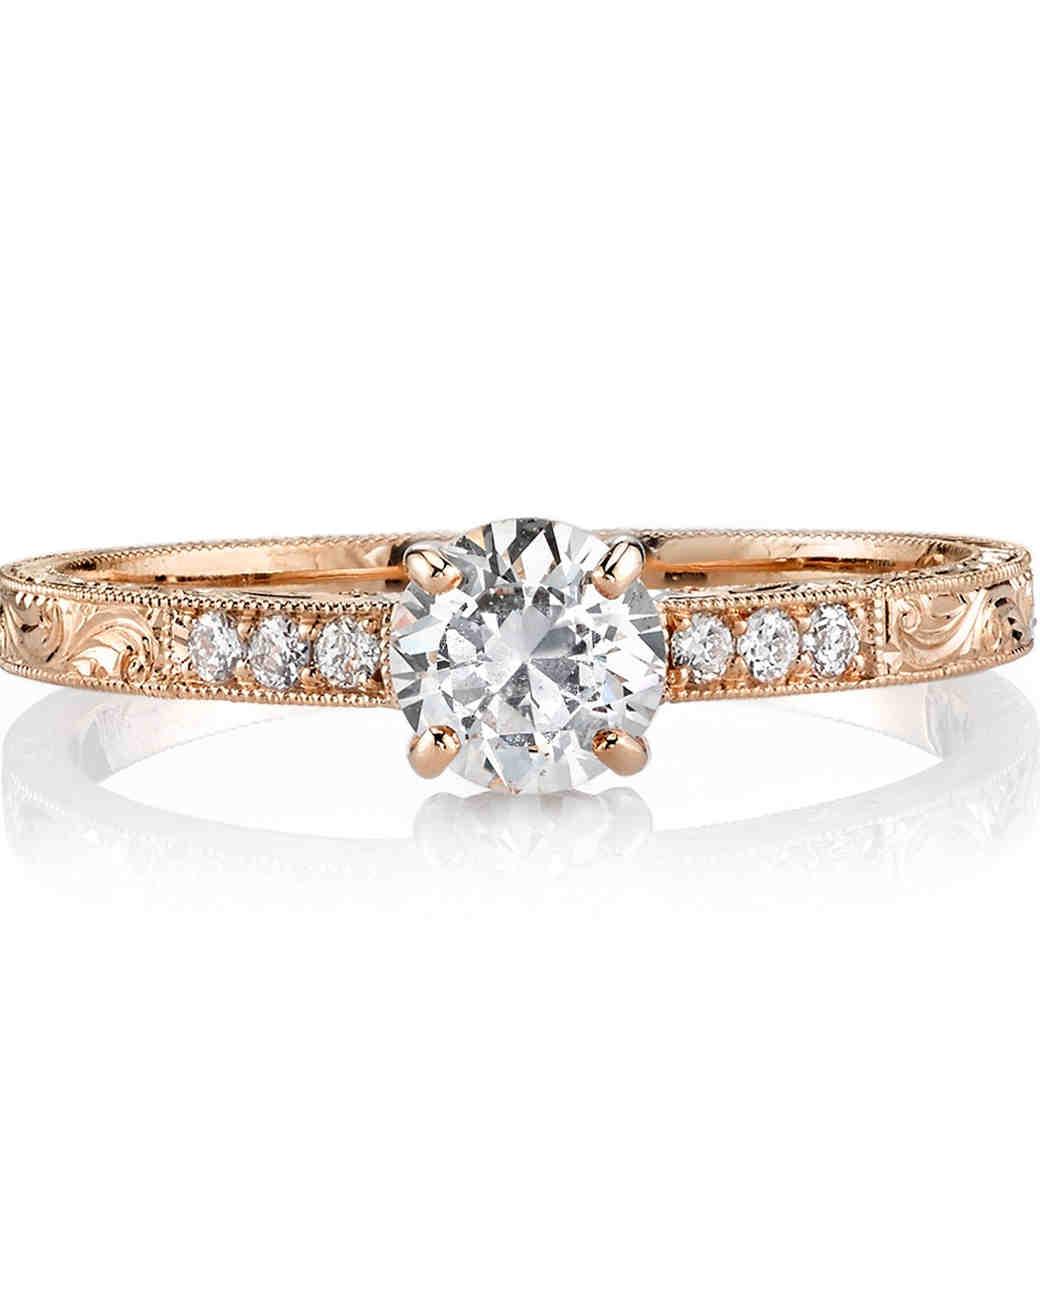 "Single Stone ""Eliza"" certified old European cut diamond set in rose gold"